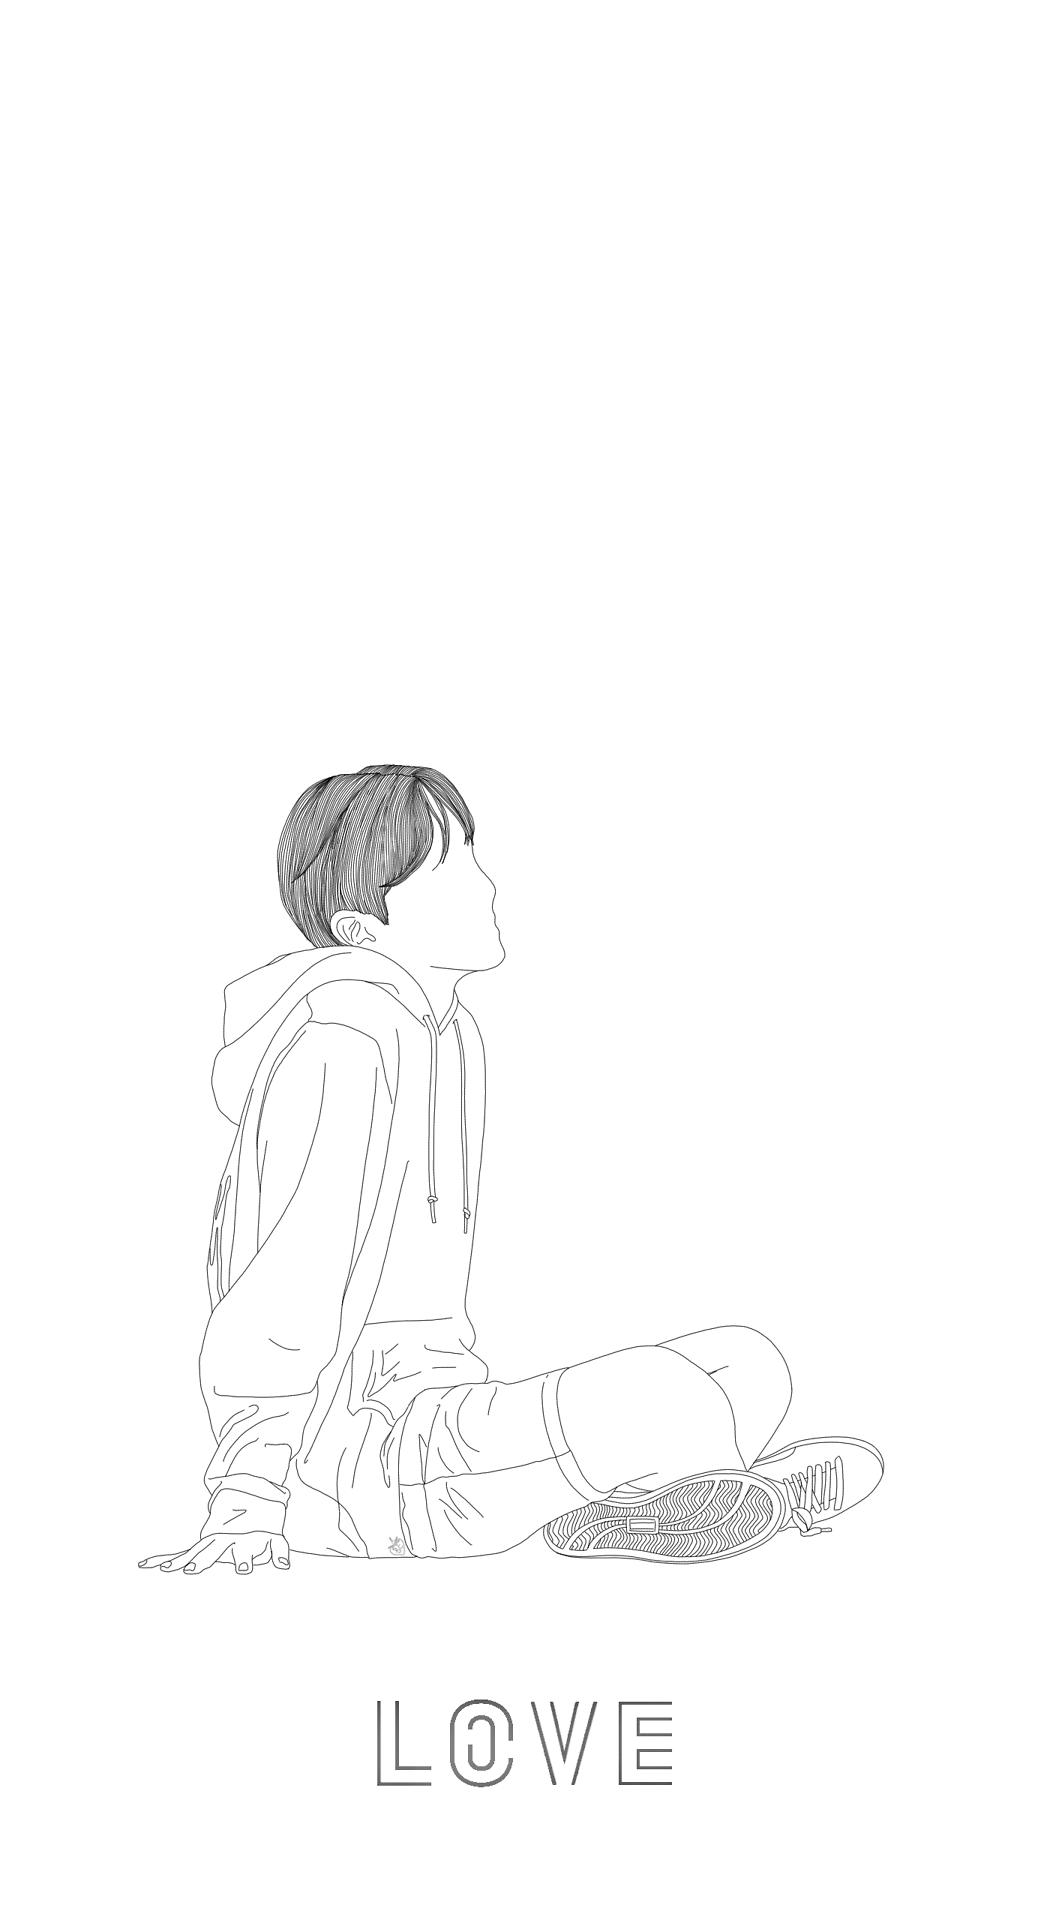 Line Art Yourself : Bts dna tumblr 방탄소년단 pinterest